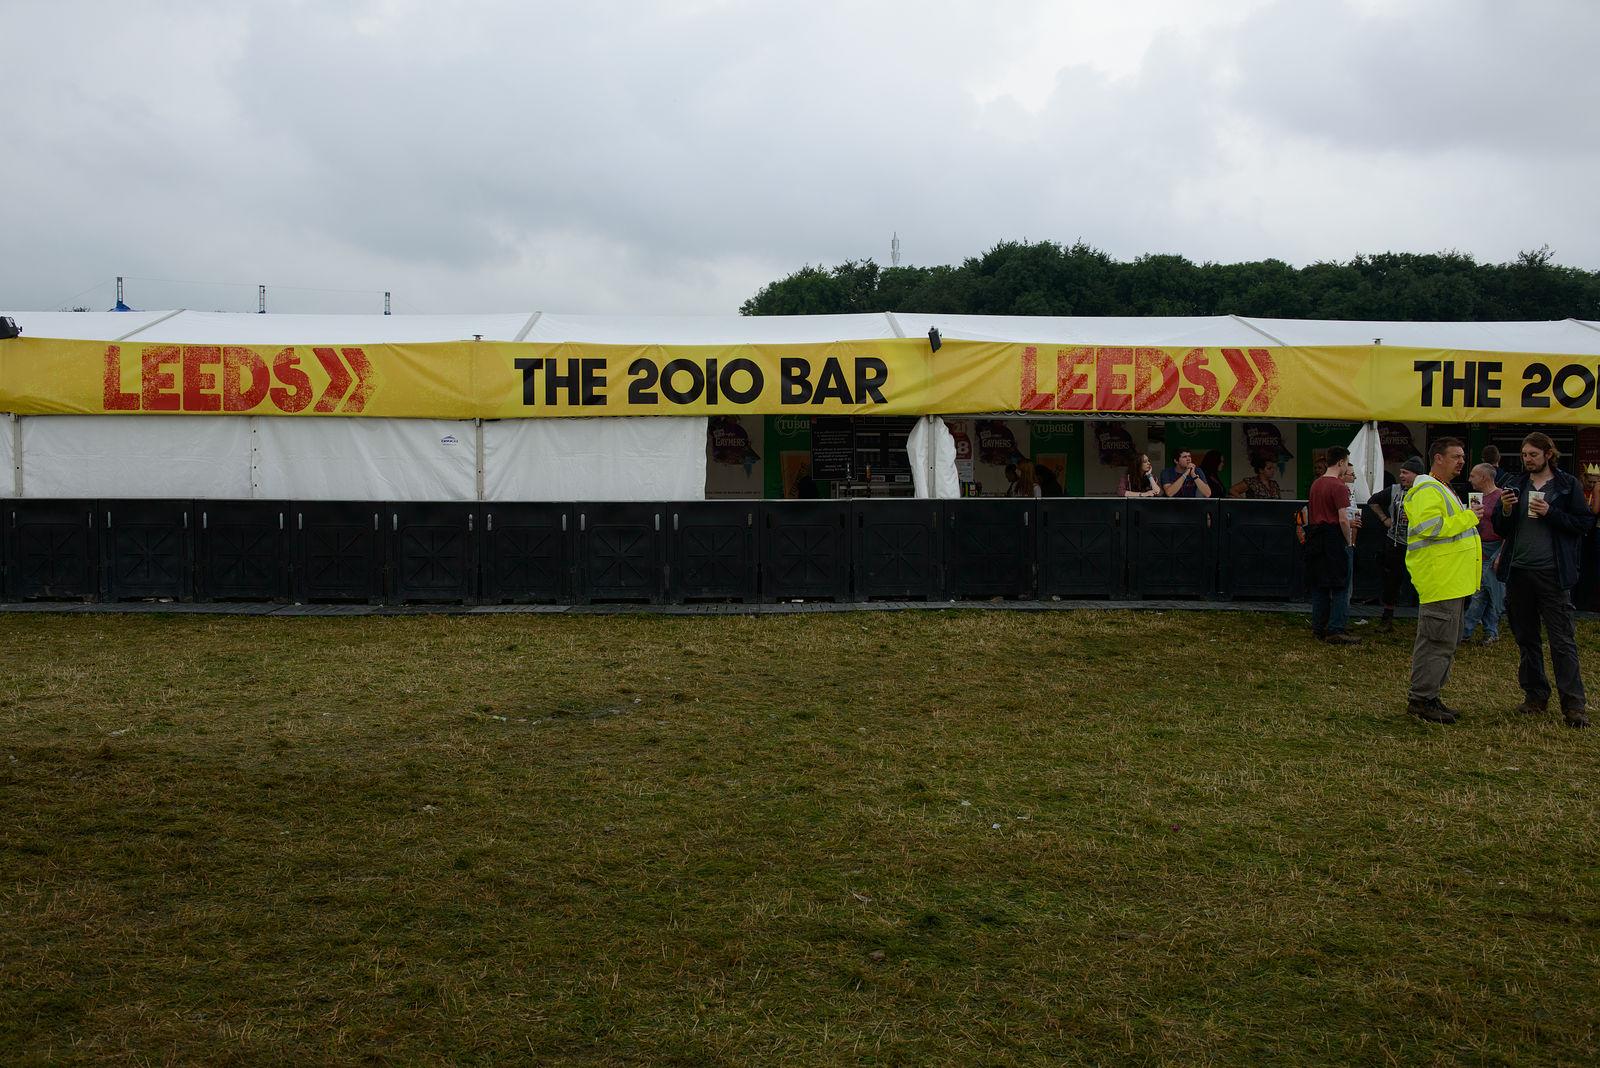 Leeds Festival 2013